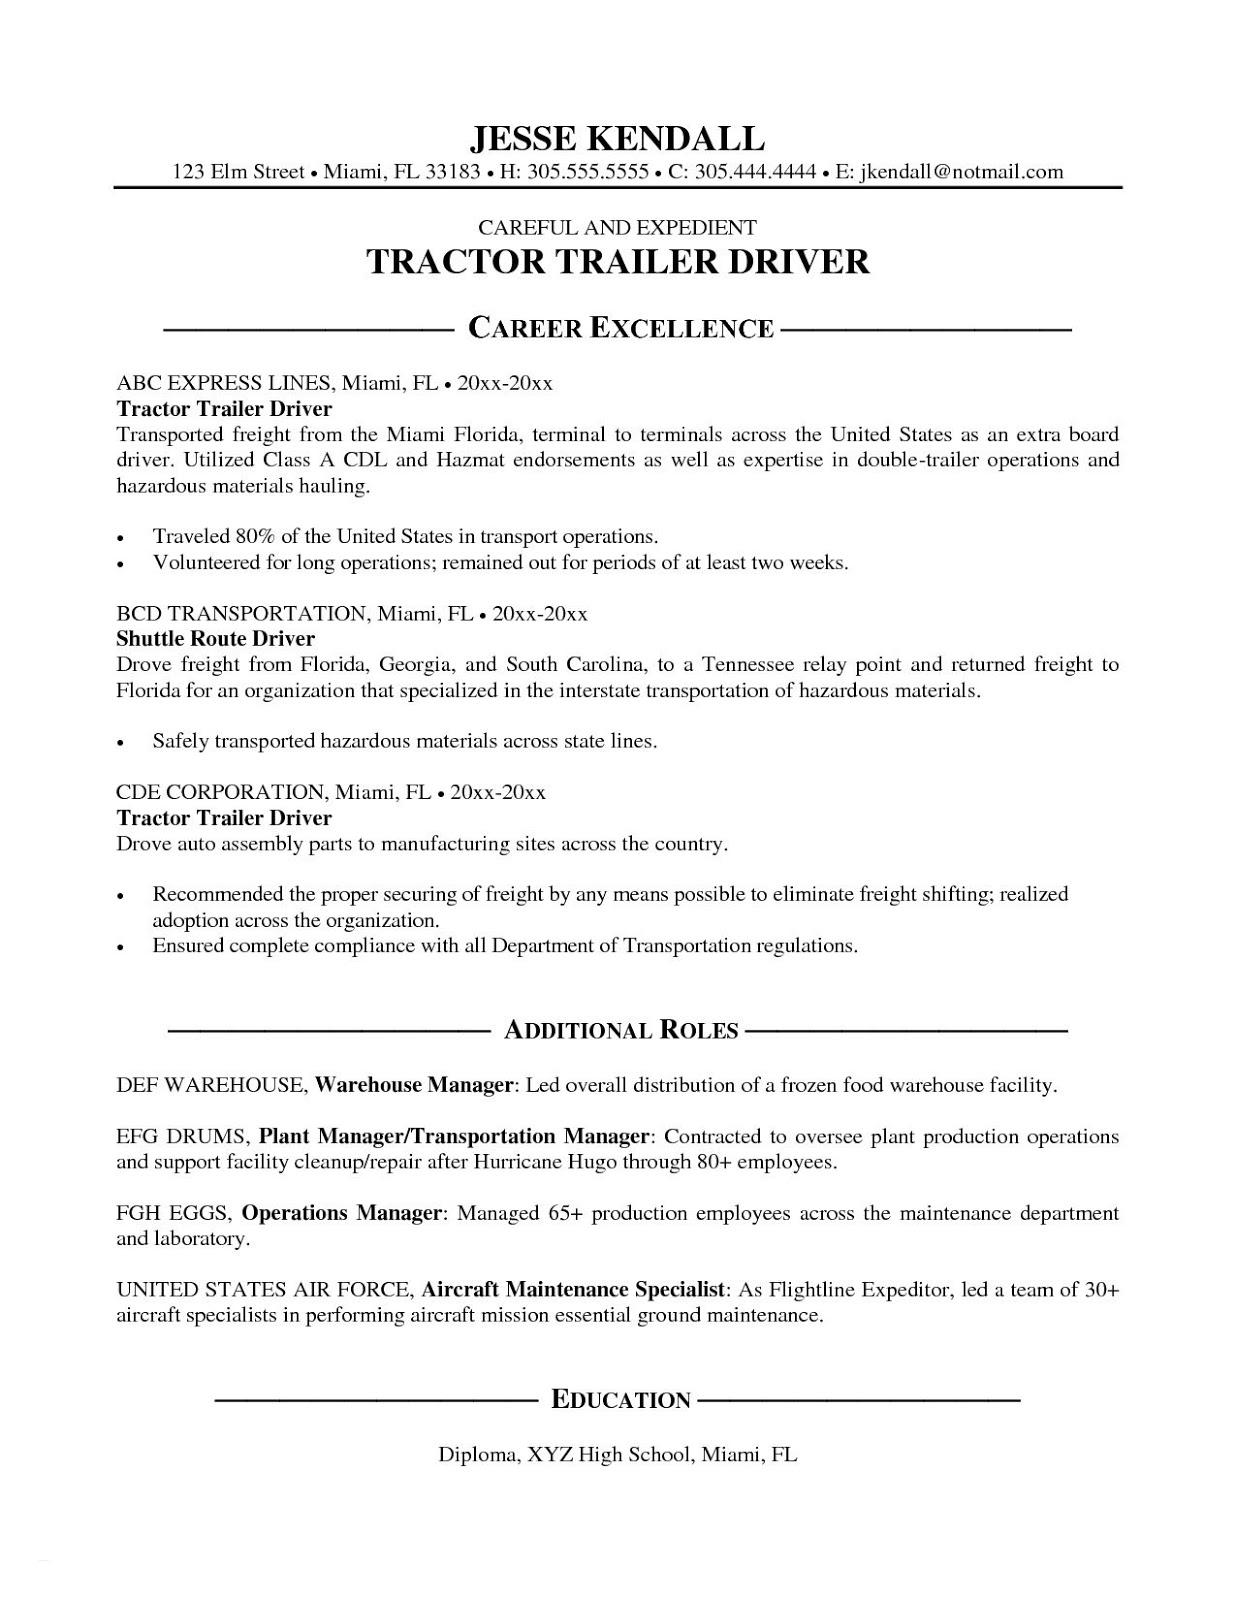 truck driver resume objective, truck driver resume objective statement, truck driver resume samples 2020, truck driver resume template word 2019 , truck driver resume template australia,